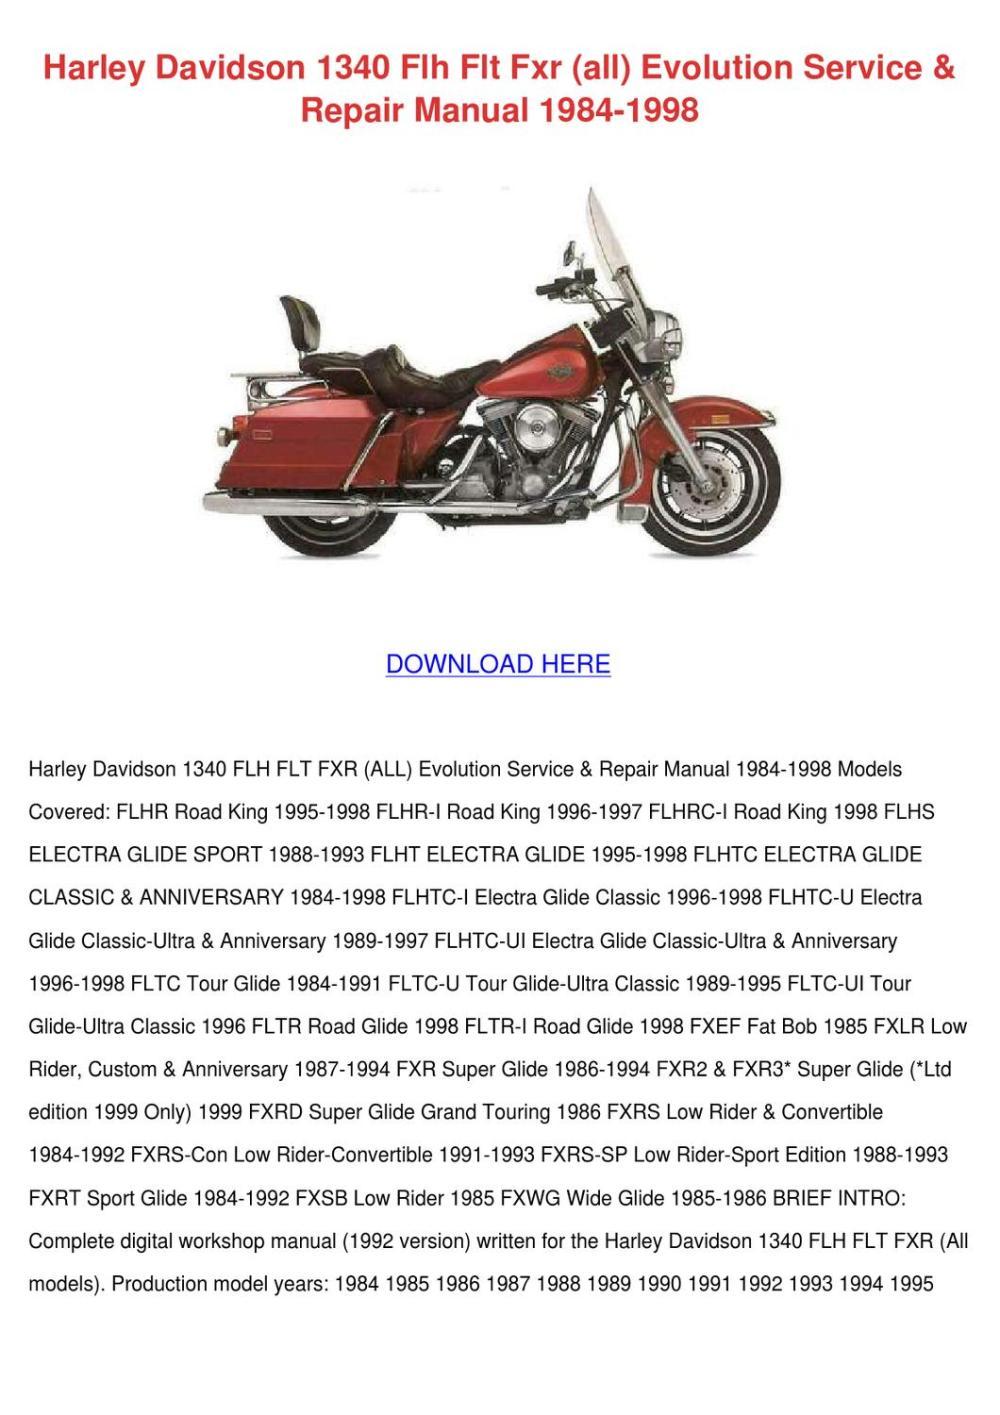 medium resolution of page 1 harley davidson 1340 flh flt fxr all evolutio by janay grogan issuu